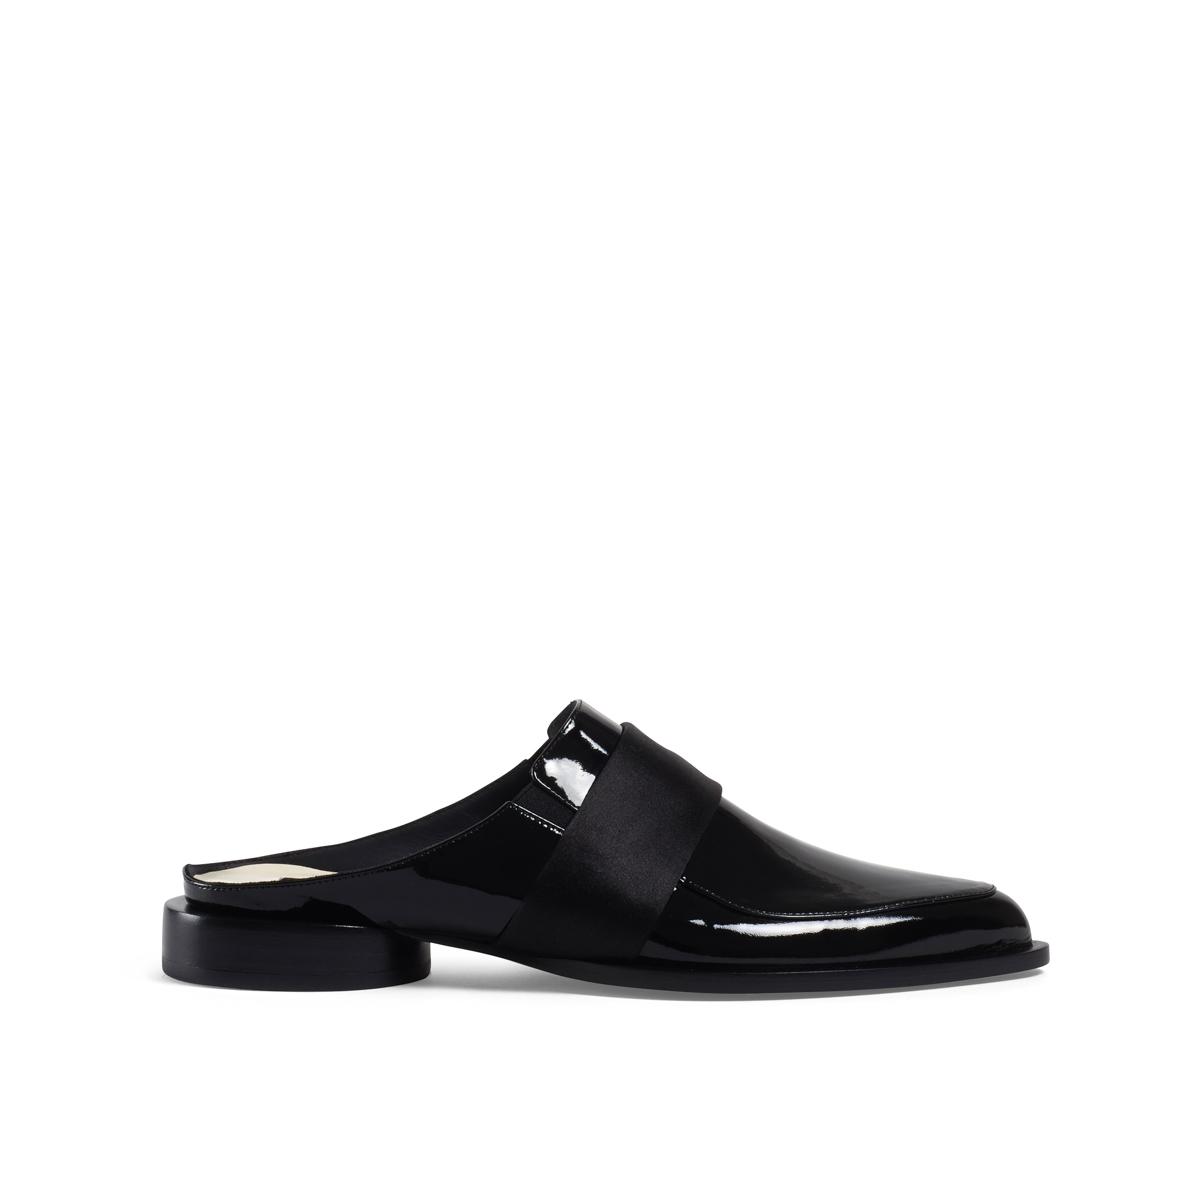 045_alaintondowski_springsummer2017_shoes_3002